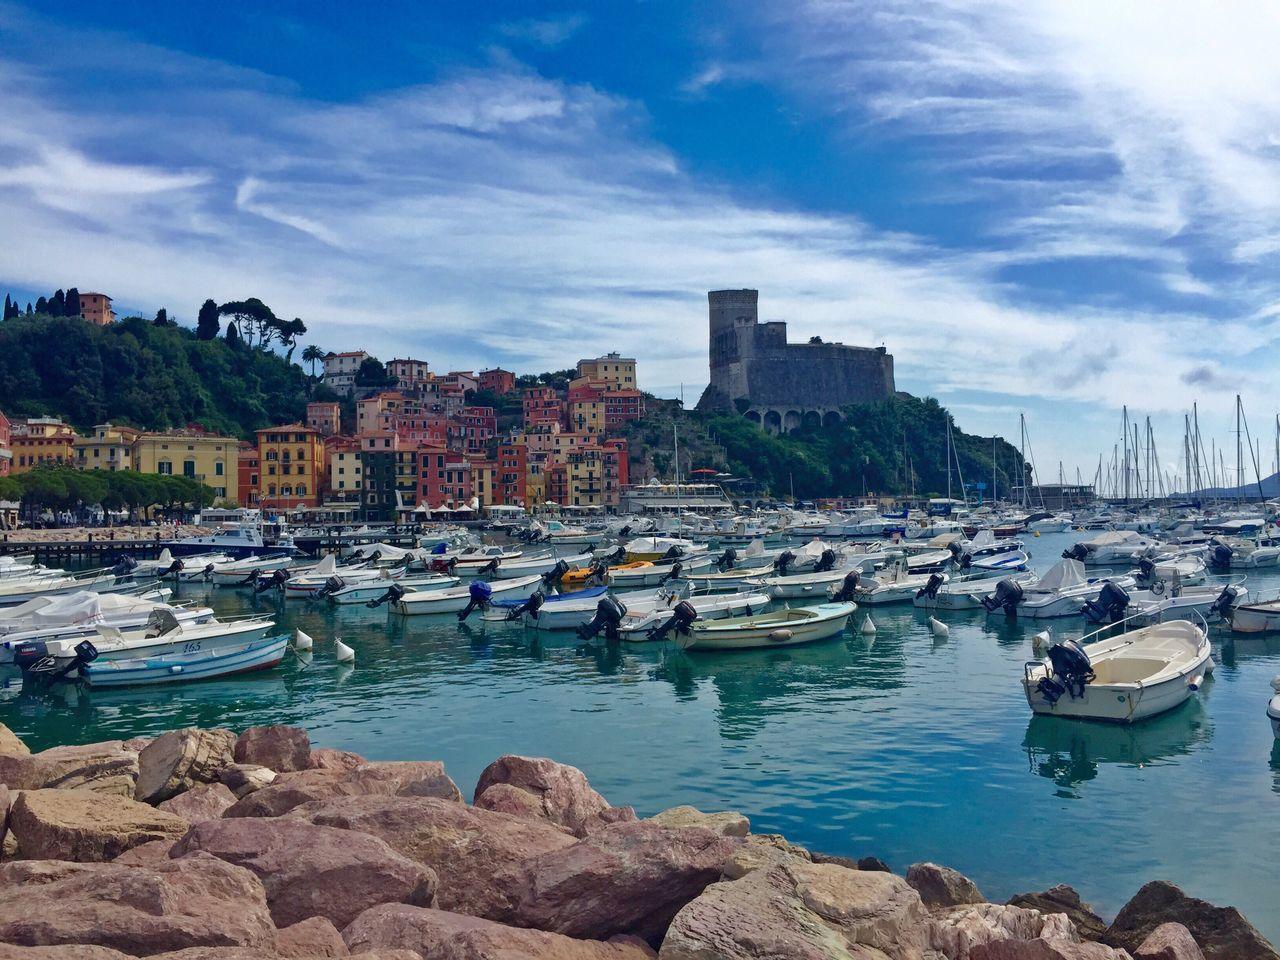 Lerici Golfo Dei Poeti La Spezia Italian Riviera Liguria Italy Italia Travel Travel Photography Beautiful Destination Rocks Boats Harbour